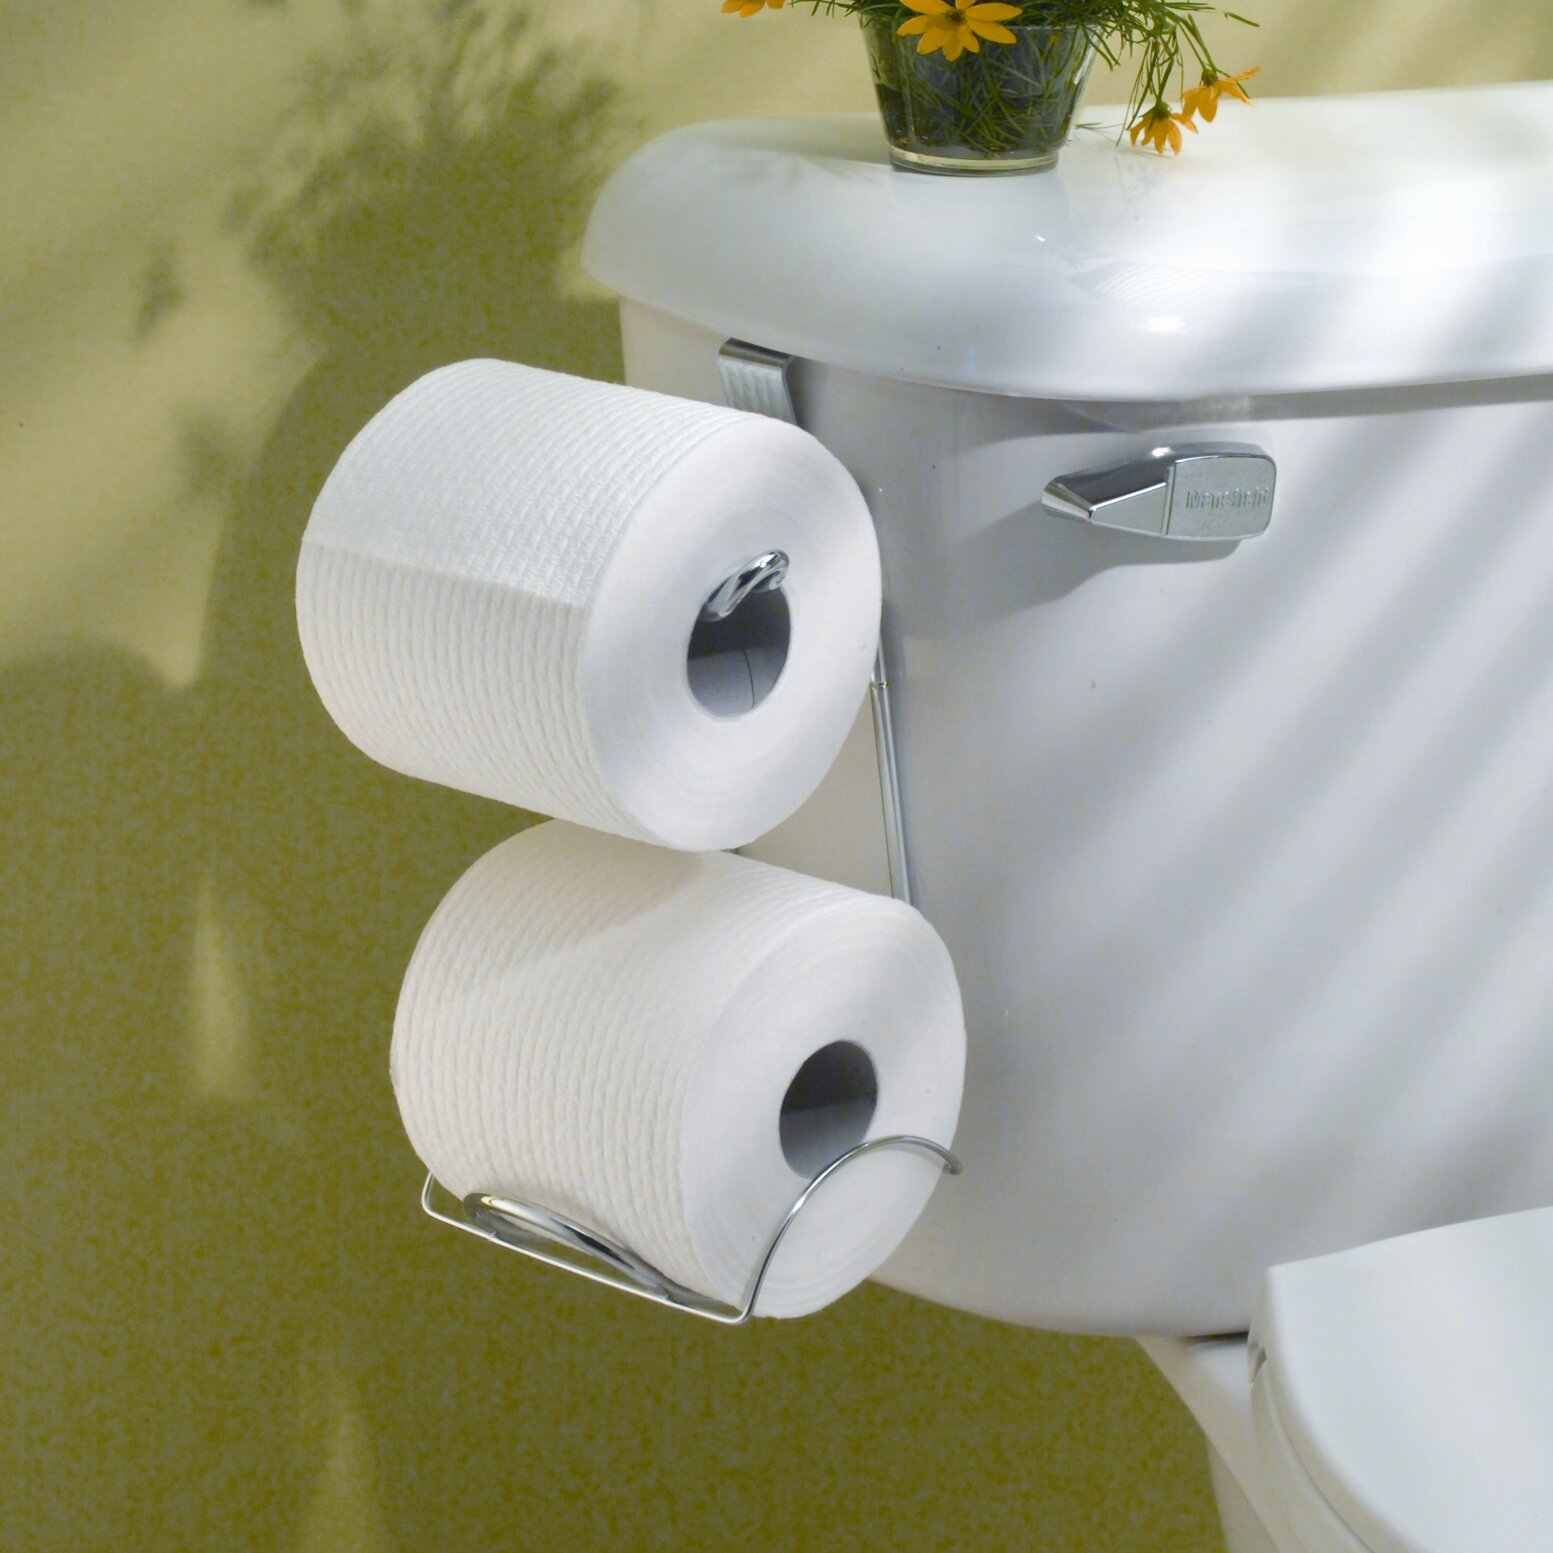 Toilet Paper Dispenser. San Jamar Dual Roll Toilet Paper Dispenser ... - interdesign classico over the toilet paper holder - Toilet Paper Dispenser